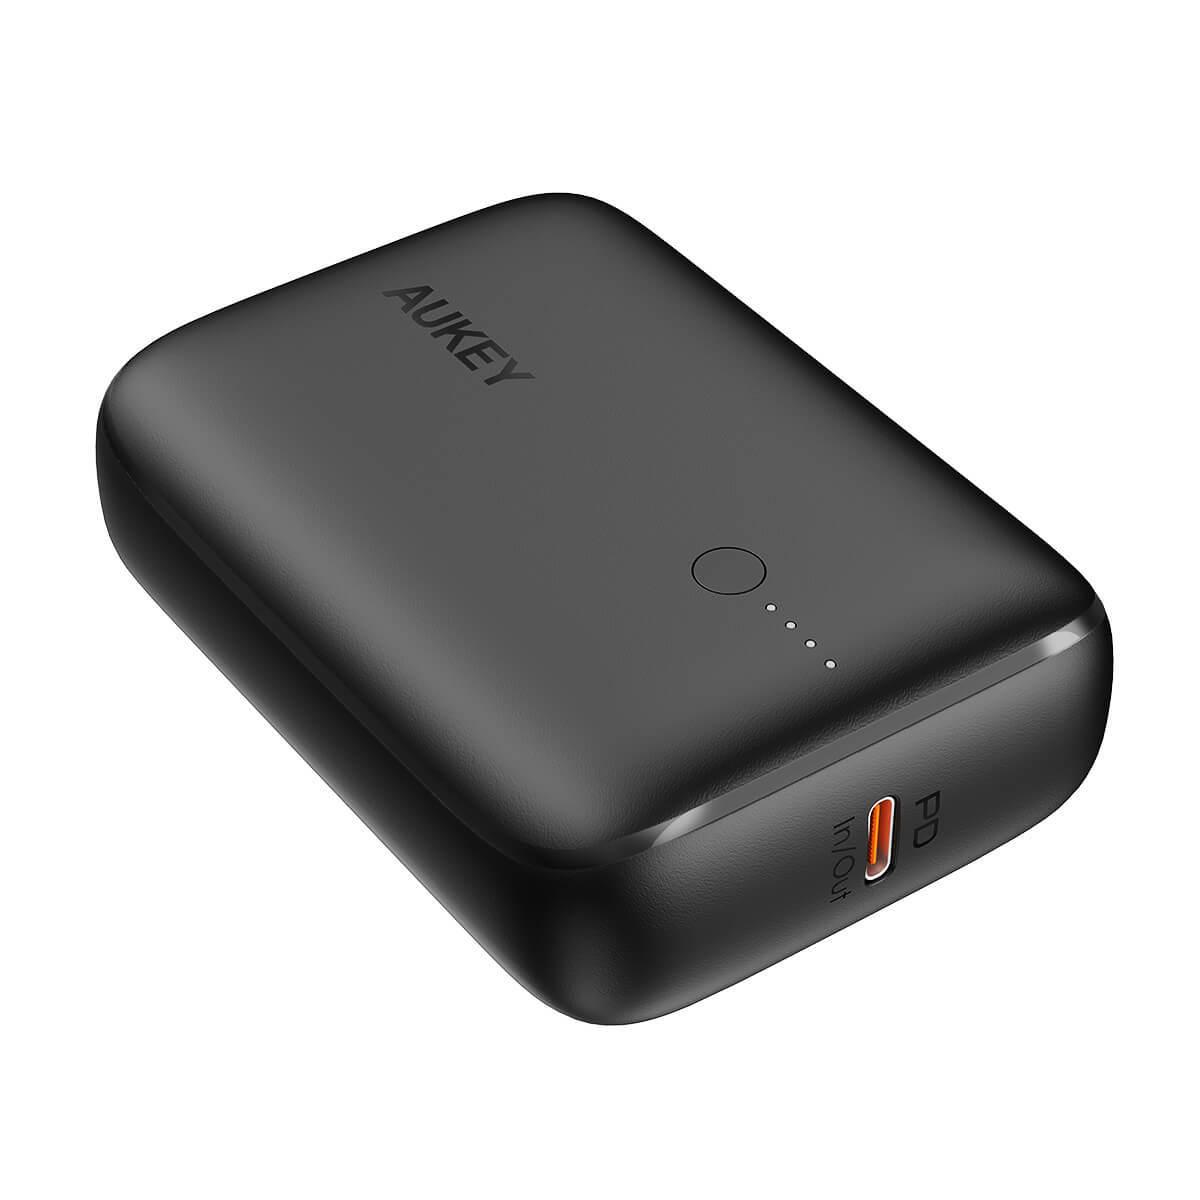 20W 10000mAh モバイルバッテリー PB-N83進化版